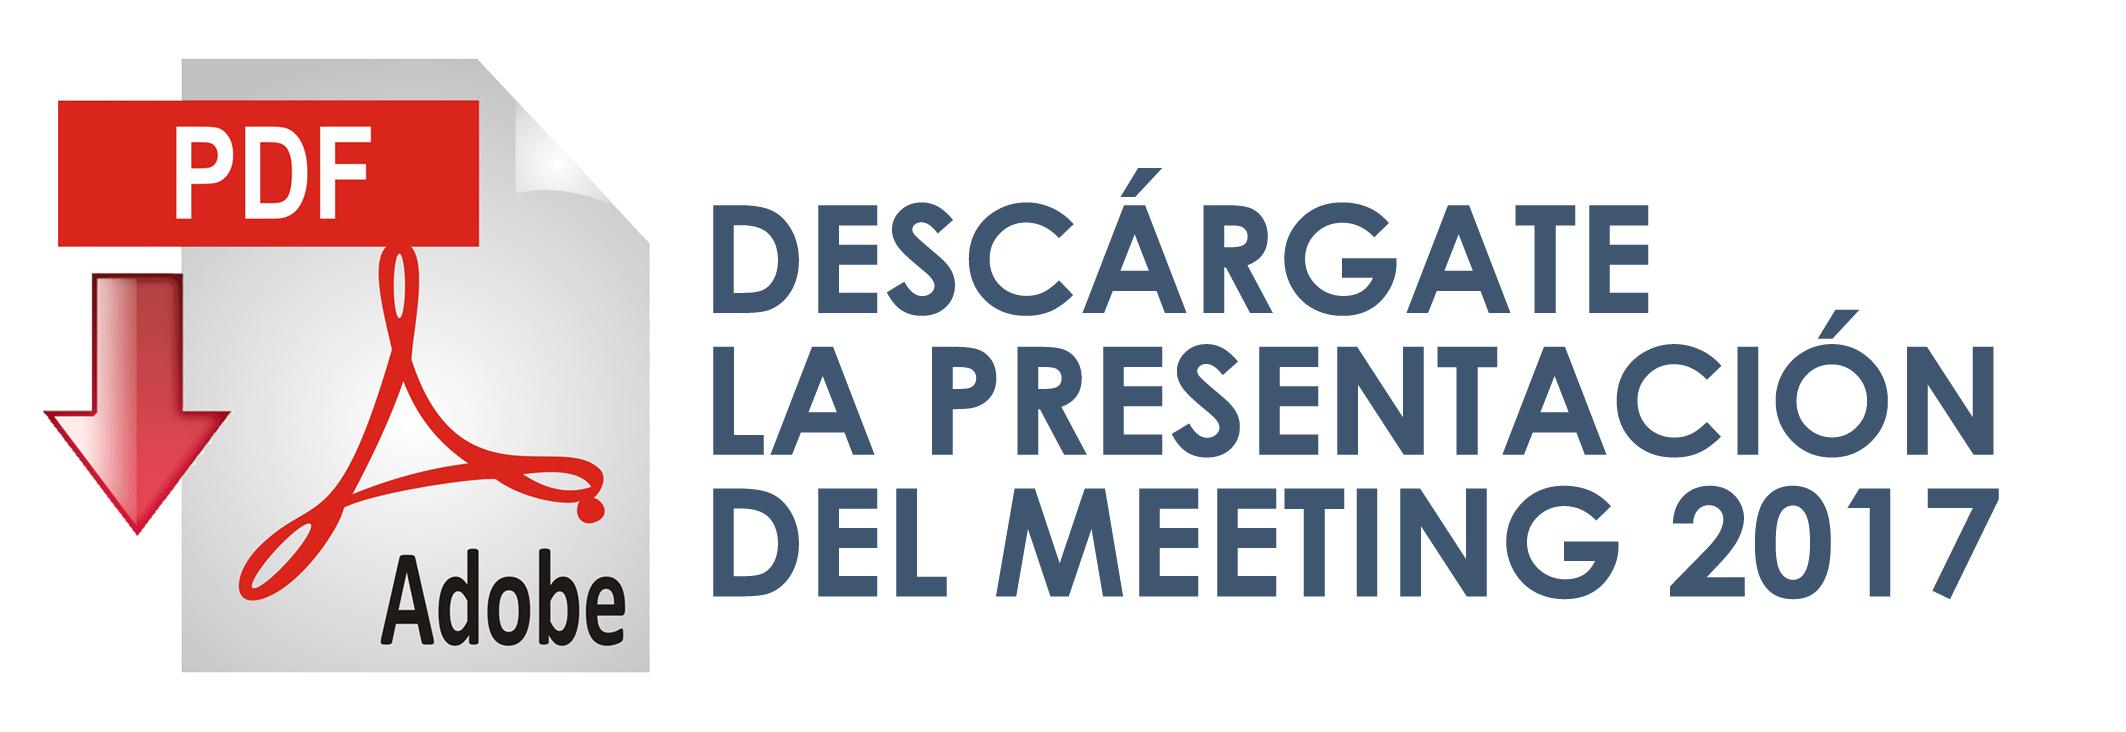 pdf_presentacion2017